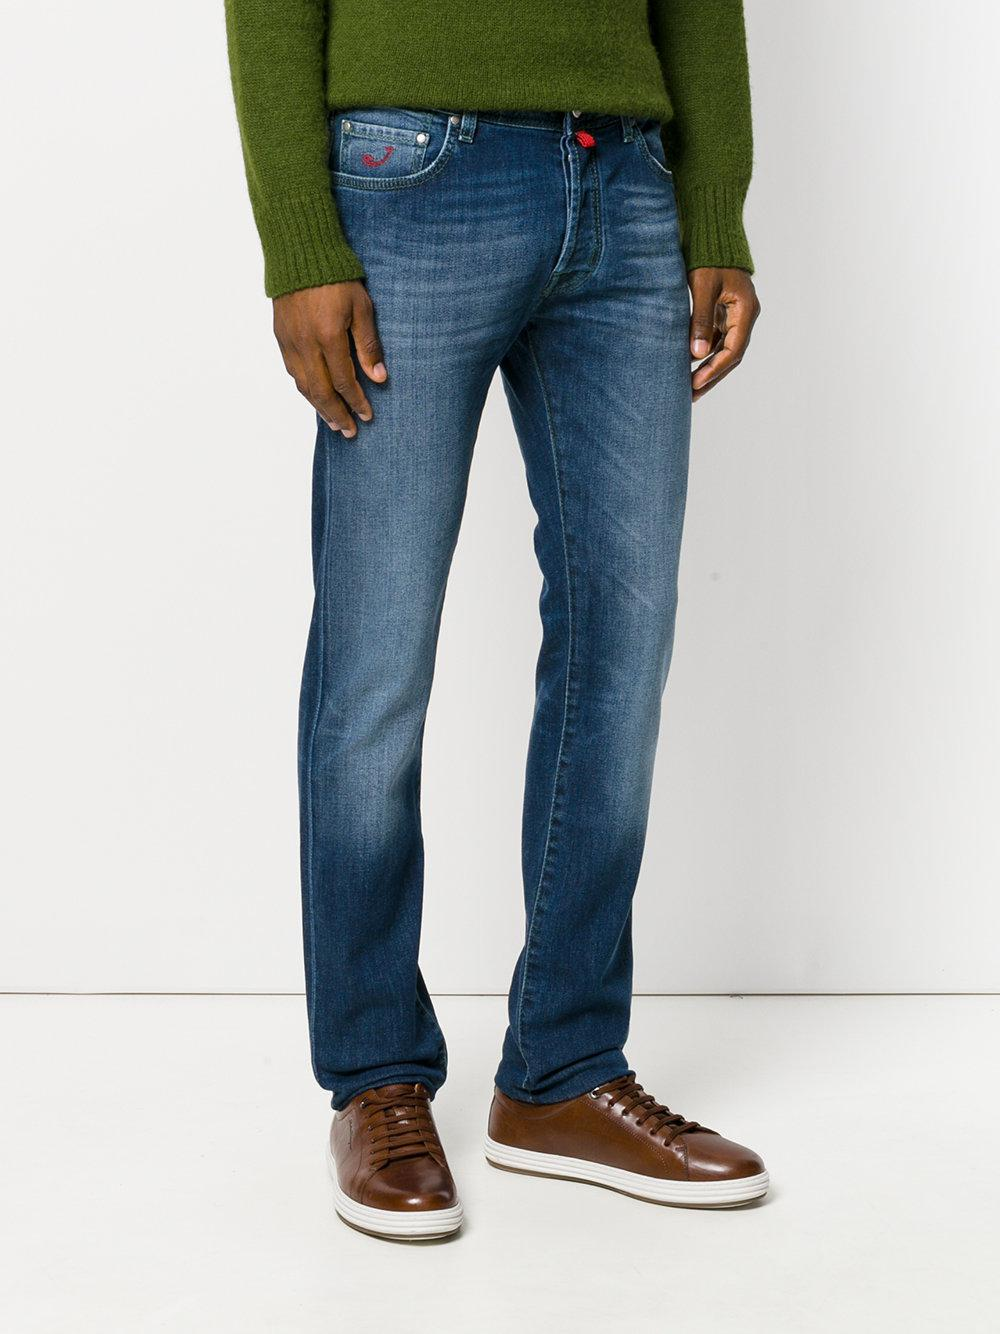 Jacob Cohen Jeans Denim in Blue for Men